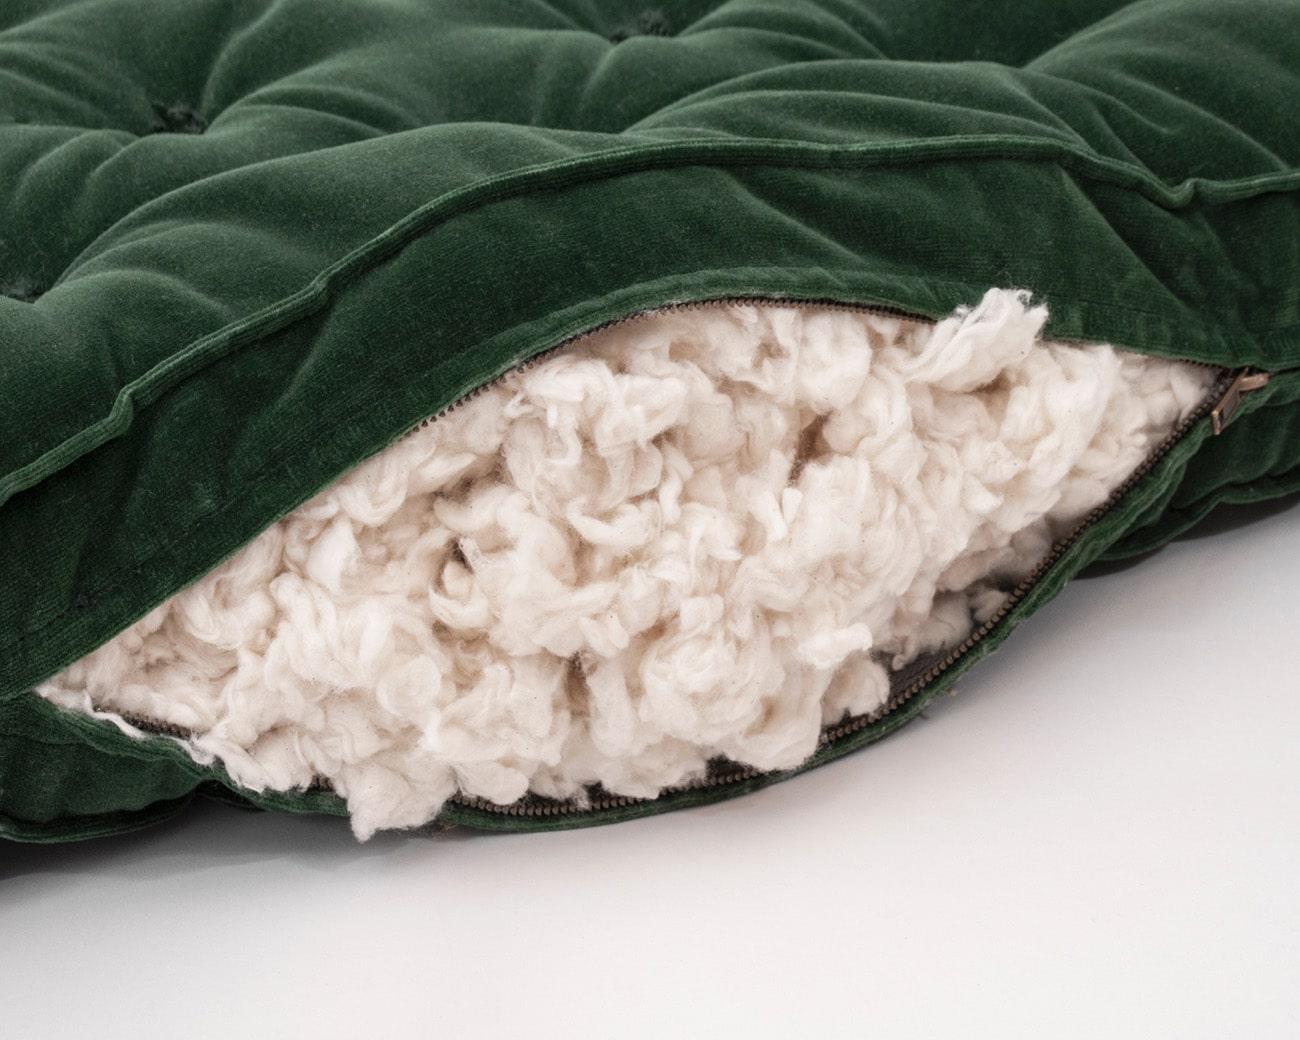 4 Cotton Filled French Mattress Cottoned Shop Handmade Decor